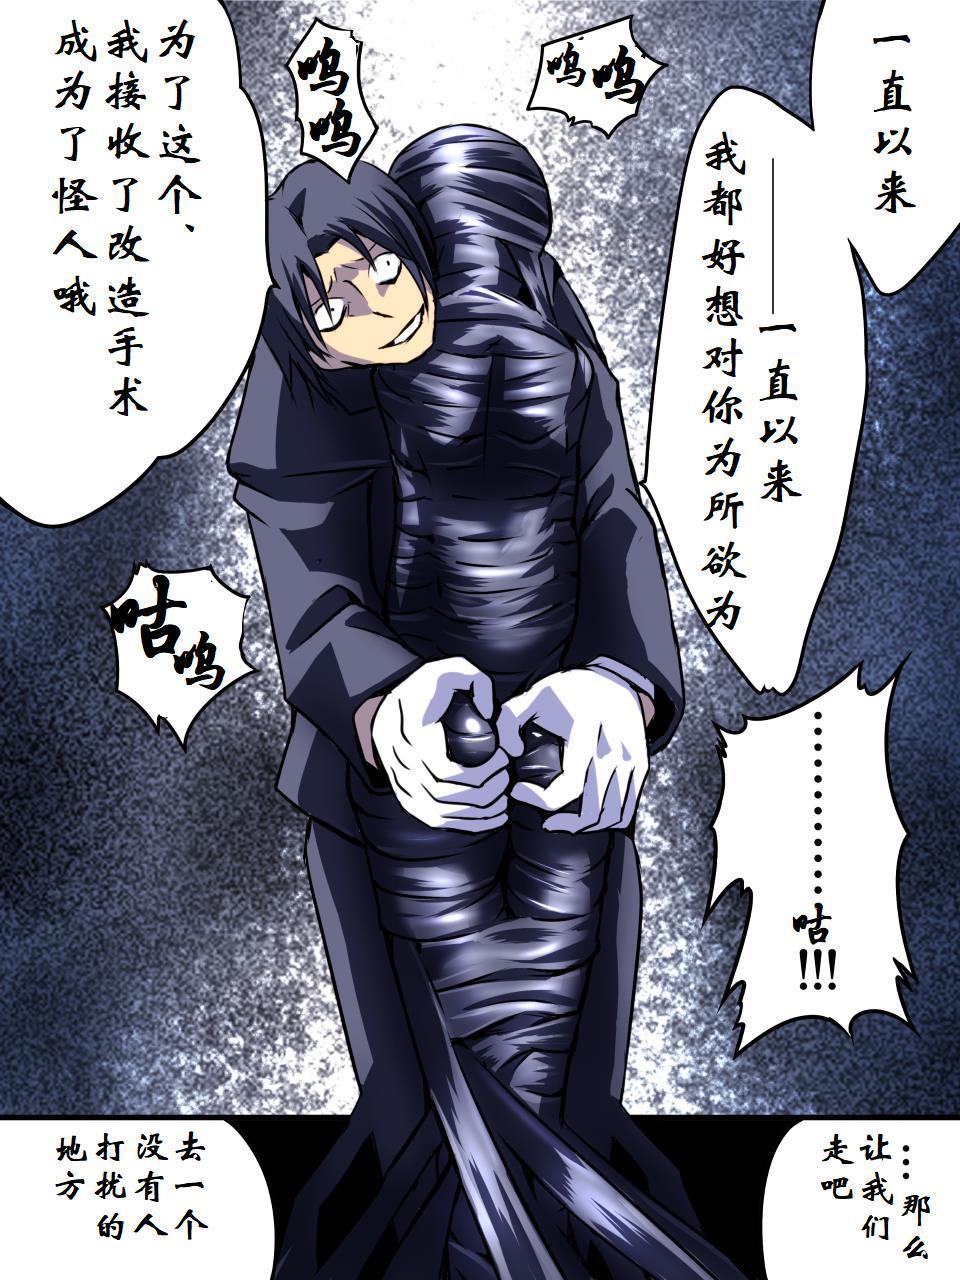 [Atelier Hachifukuan] Superheroine Yuukai Ryoujoku III - Superheroine in Distress [Chrome Rose Bell]   凌辱诱拐3 [Chinese] [有条色狼汉化] 14